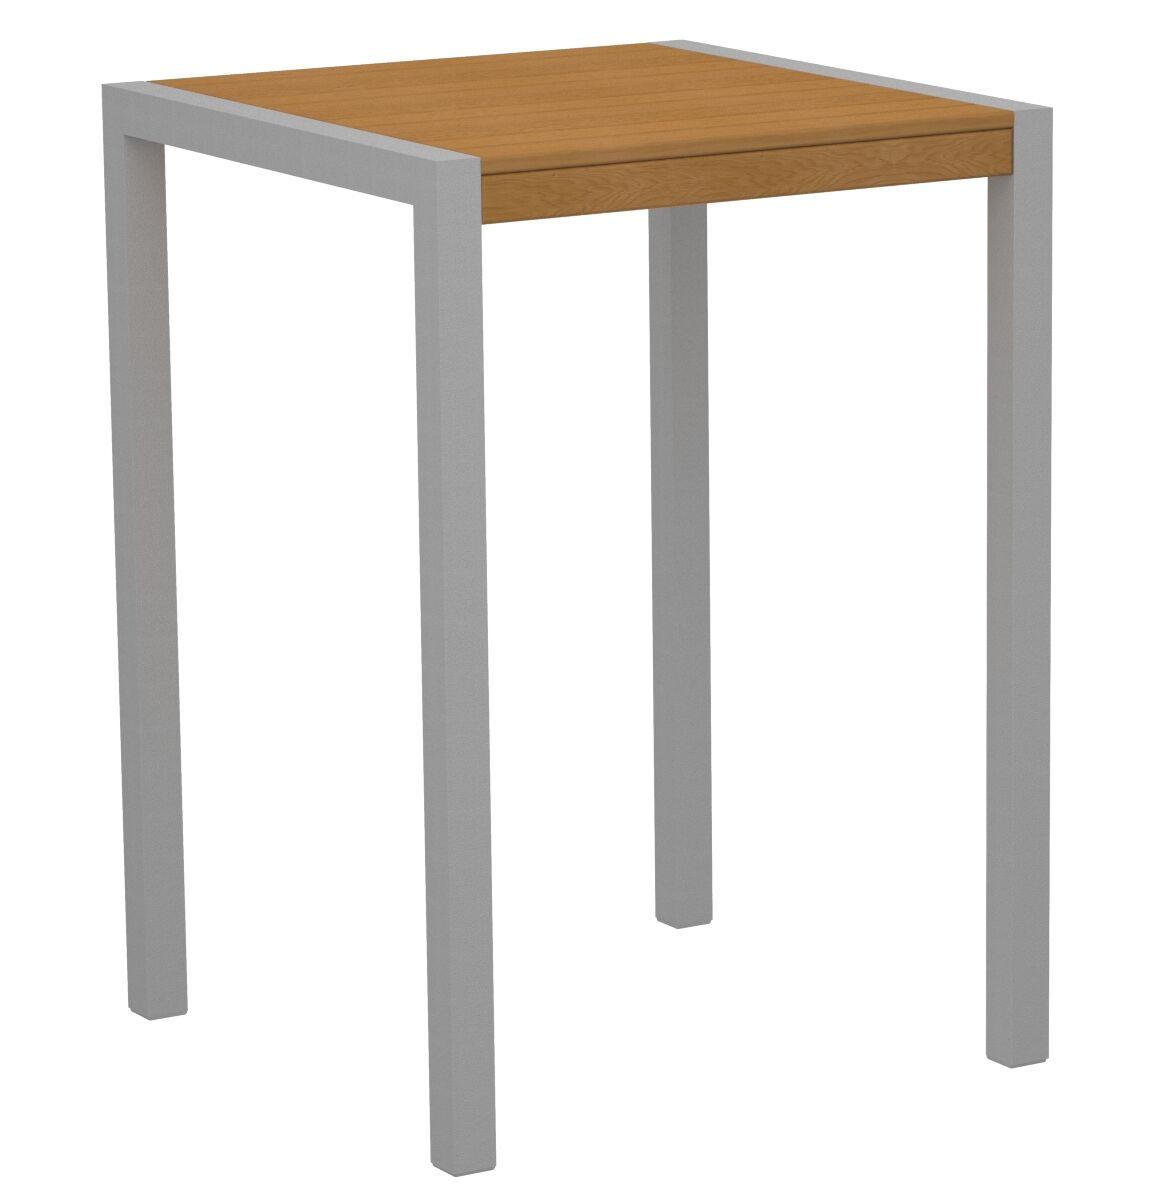 Mod Bar Table Base Finish: Textured White, Top Finish: Plastique